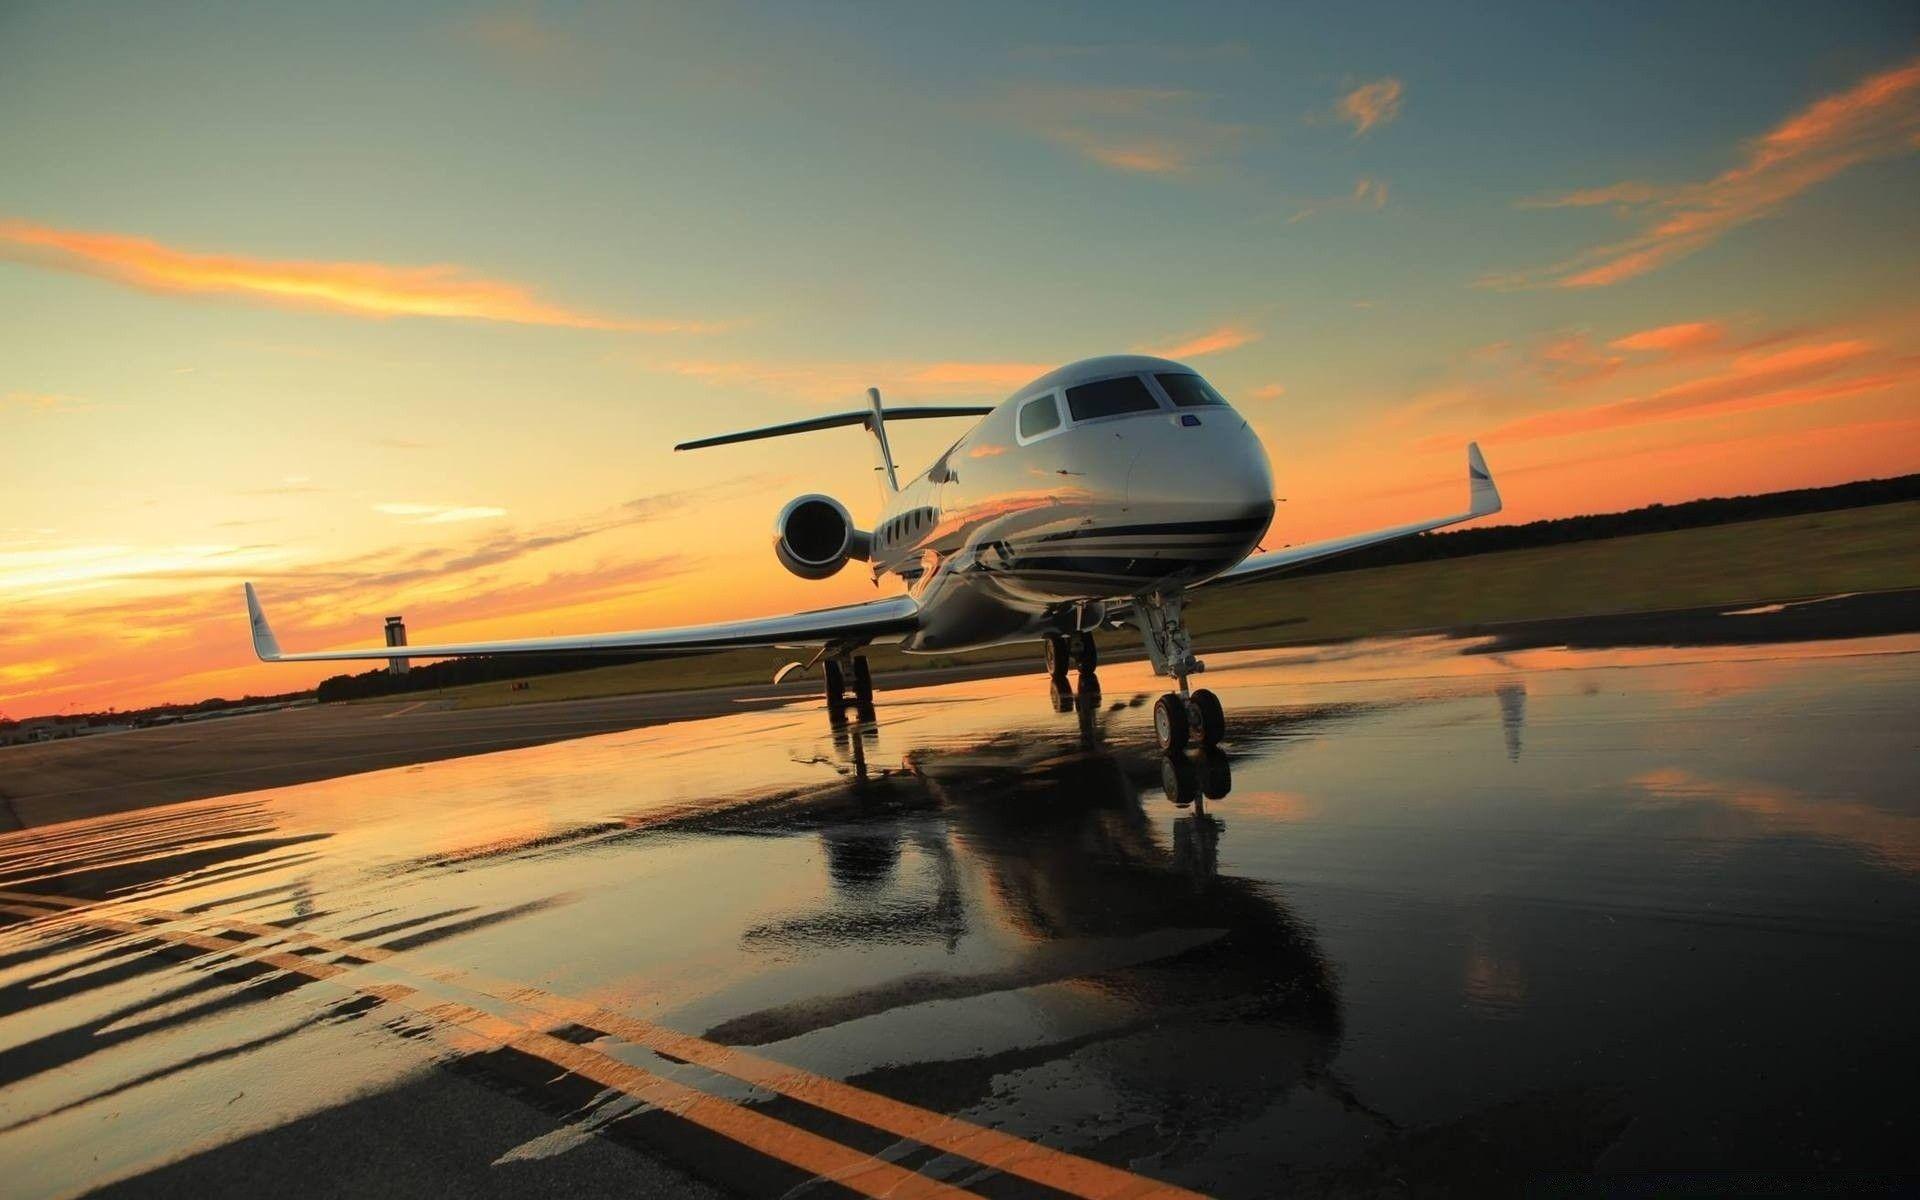 chennai international airport images